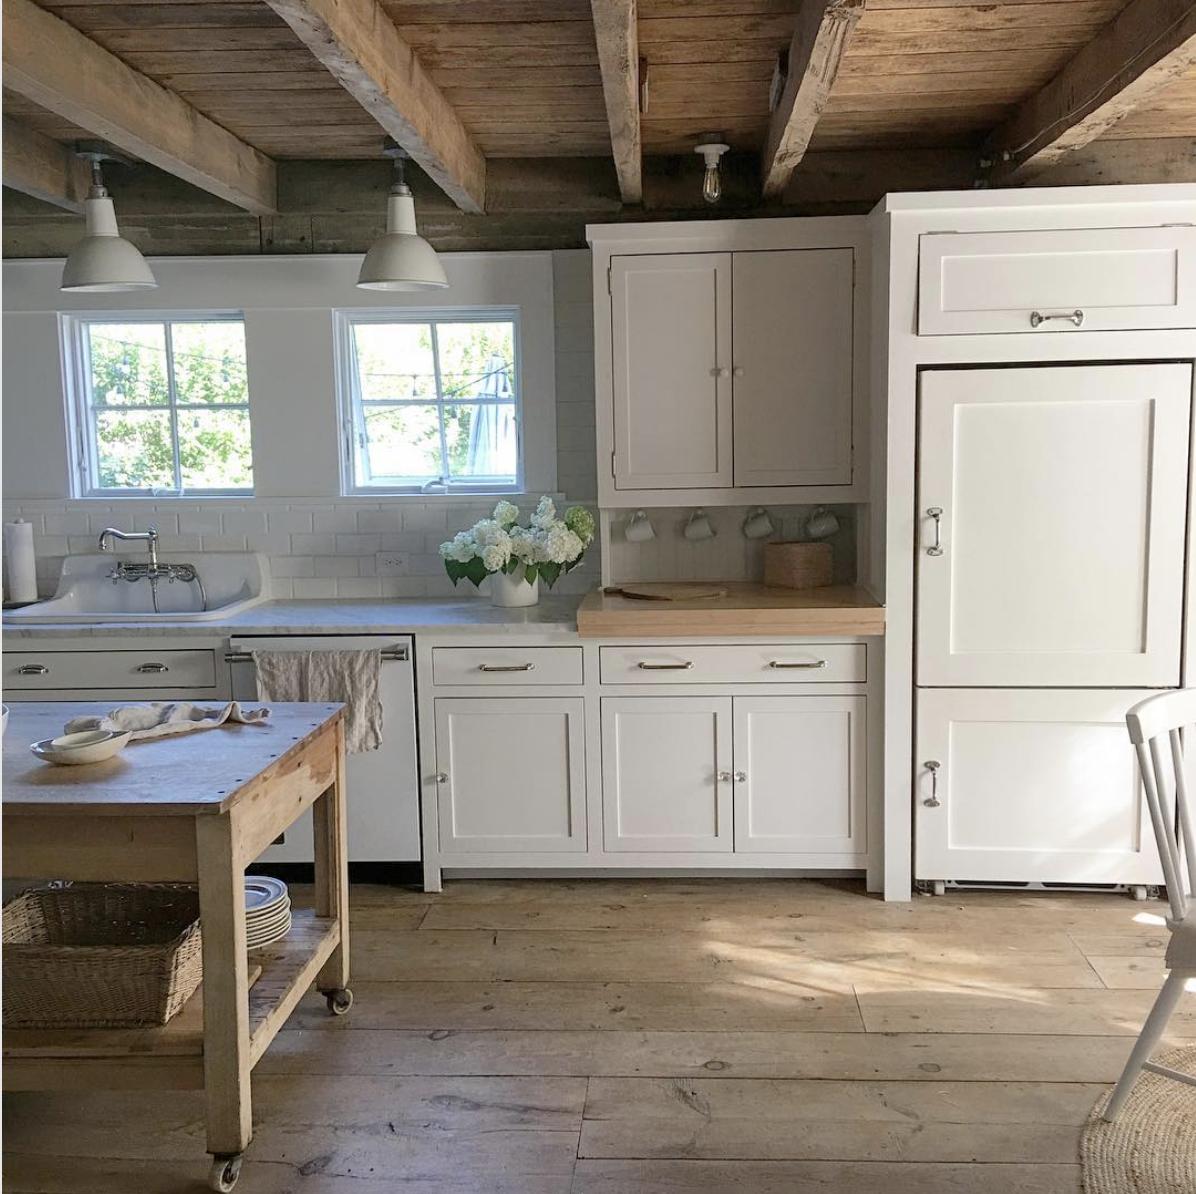 Rustic Modern Farmhouse Kitchen Design Ideas Maison de